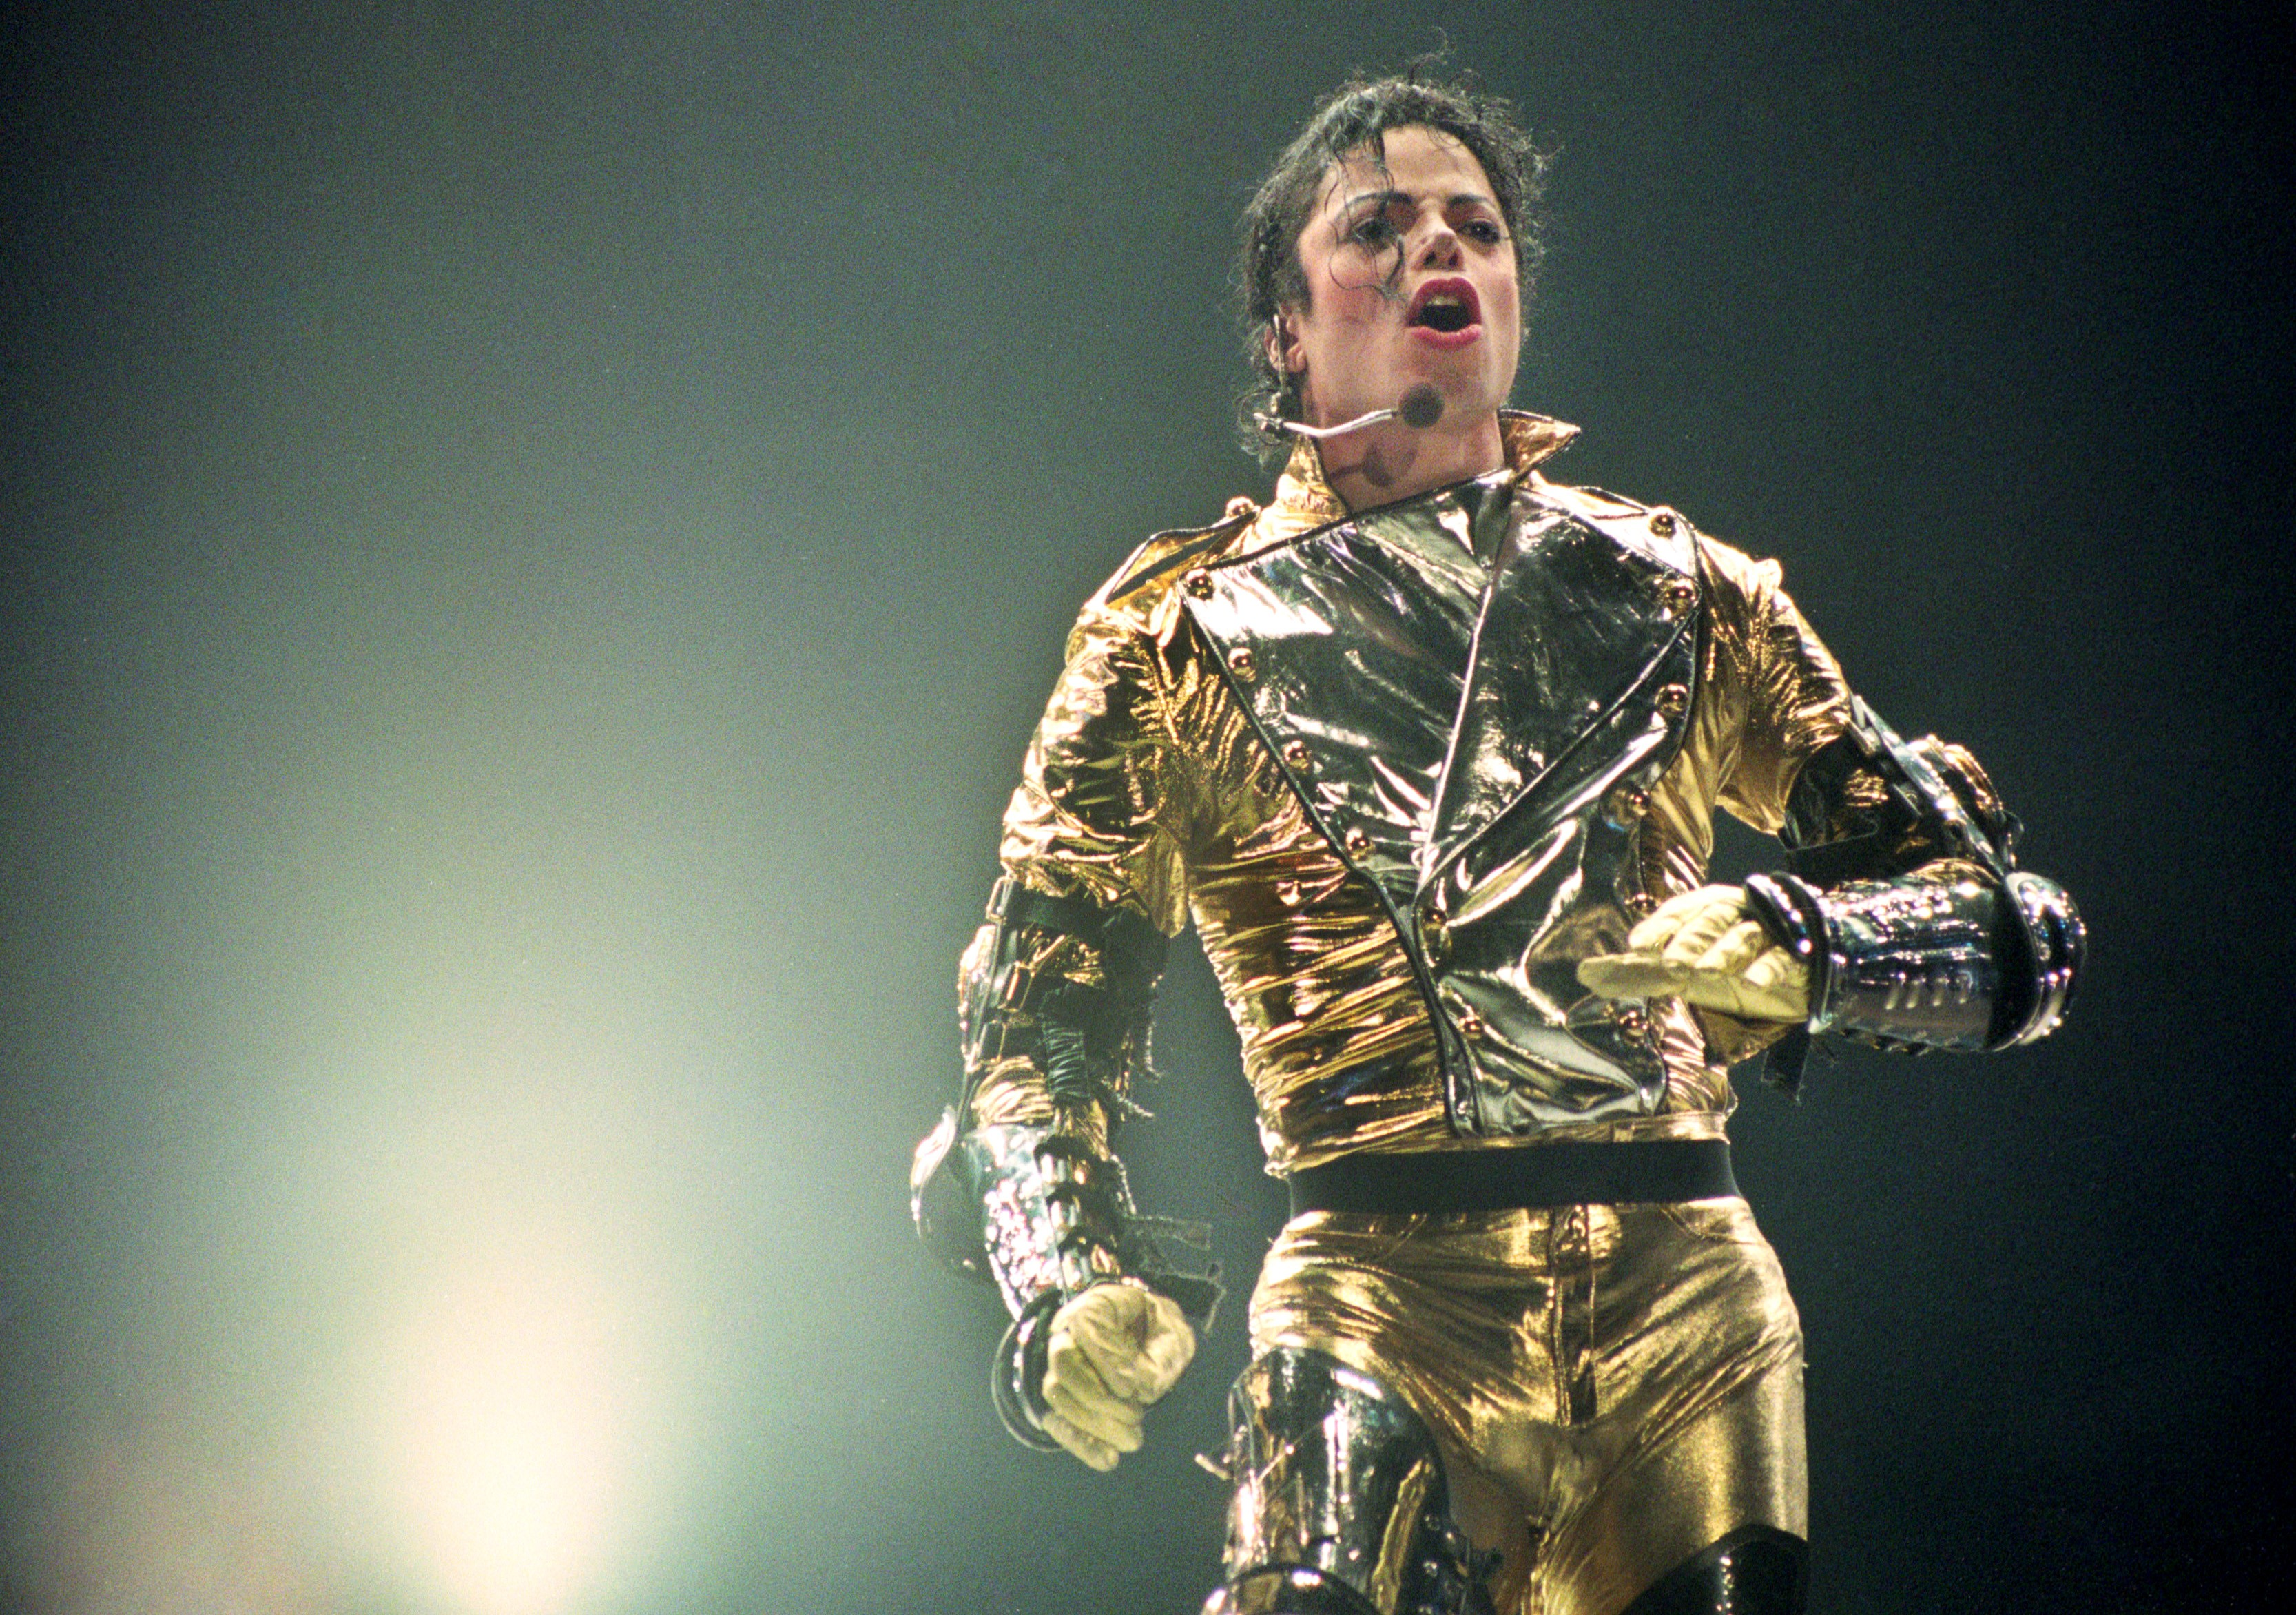 Michael Jackson musical